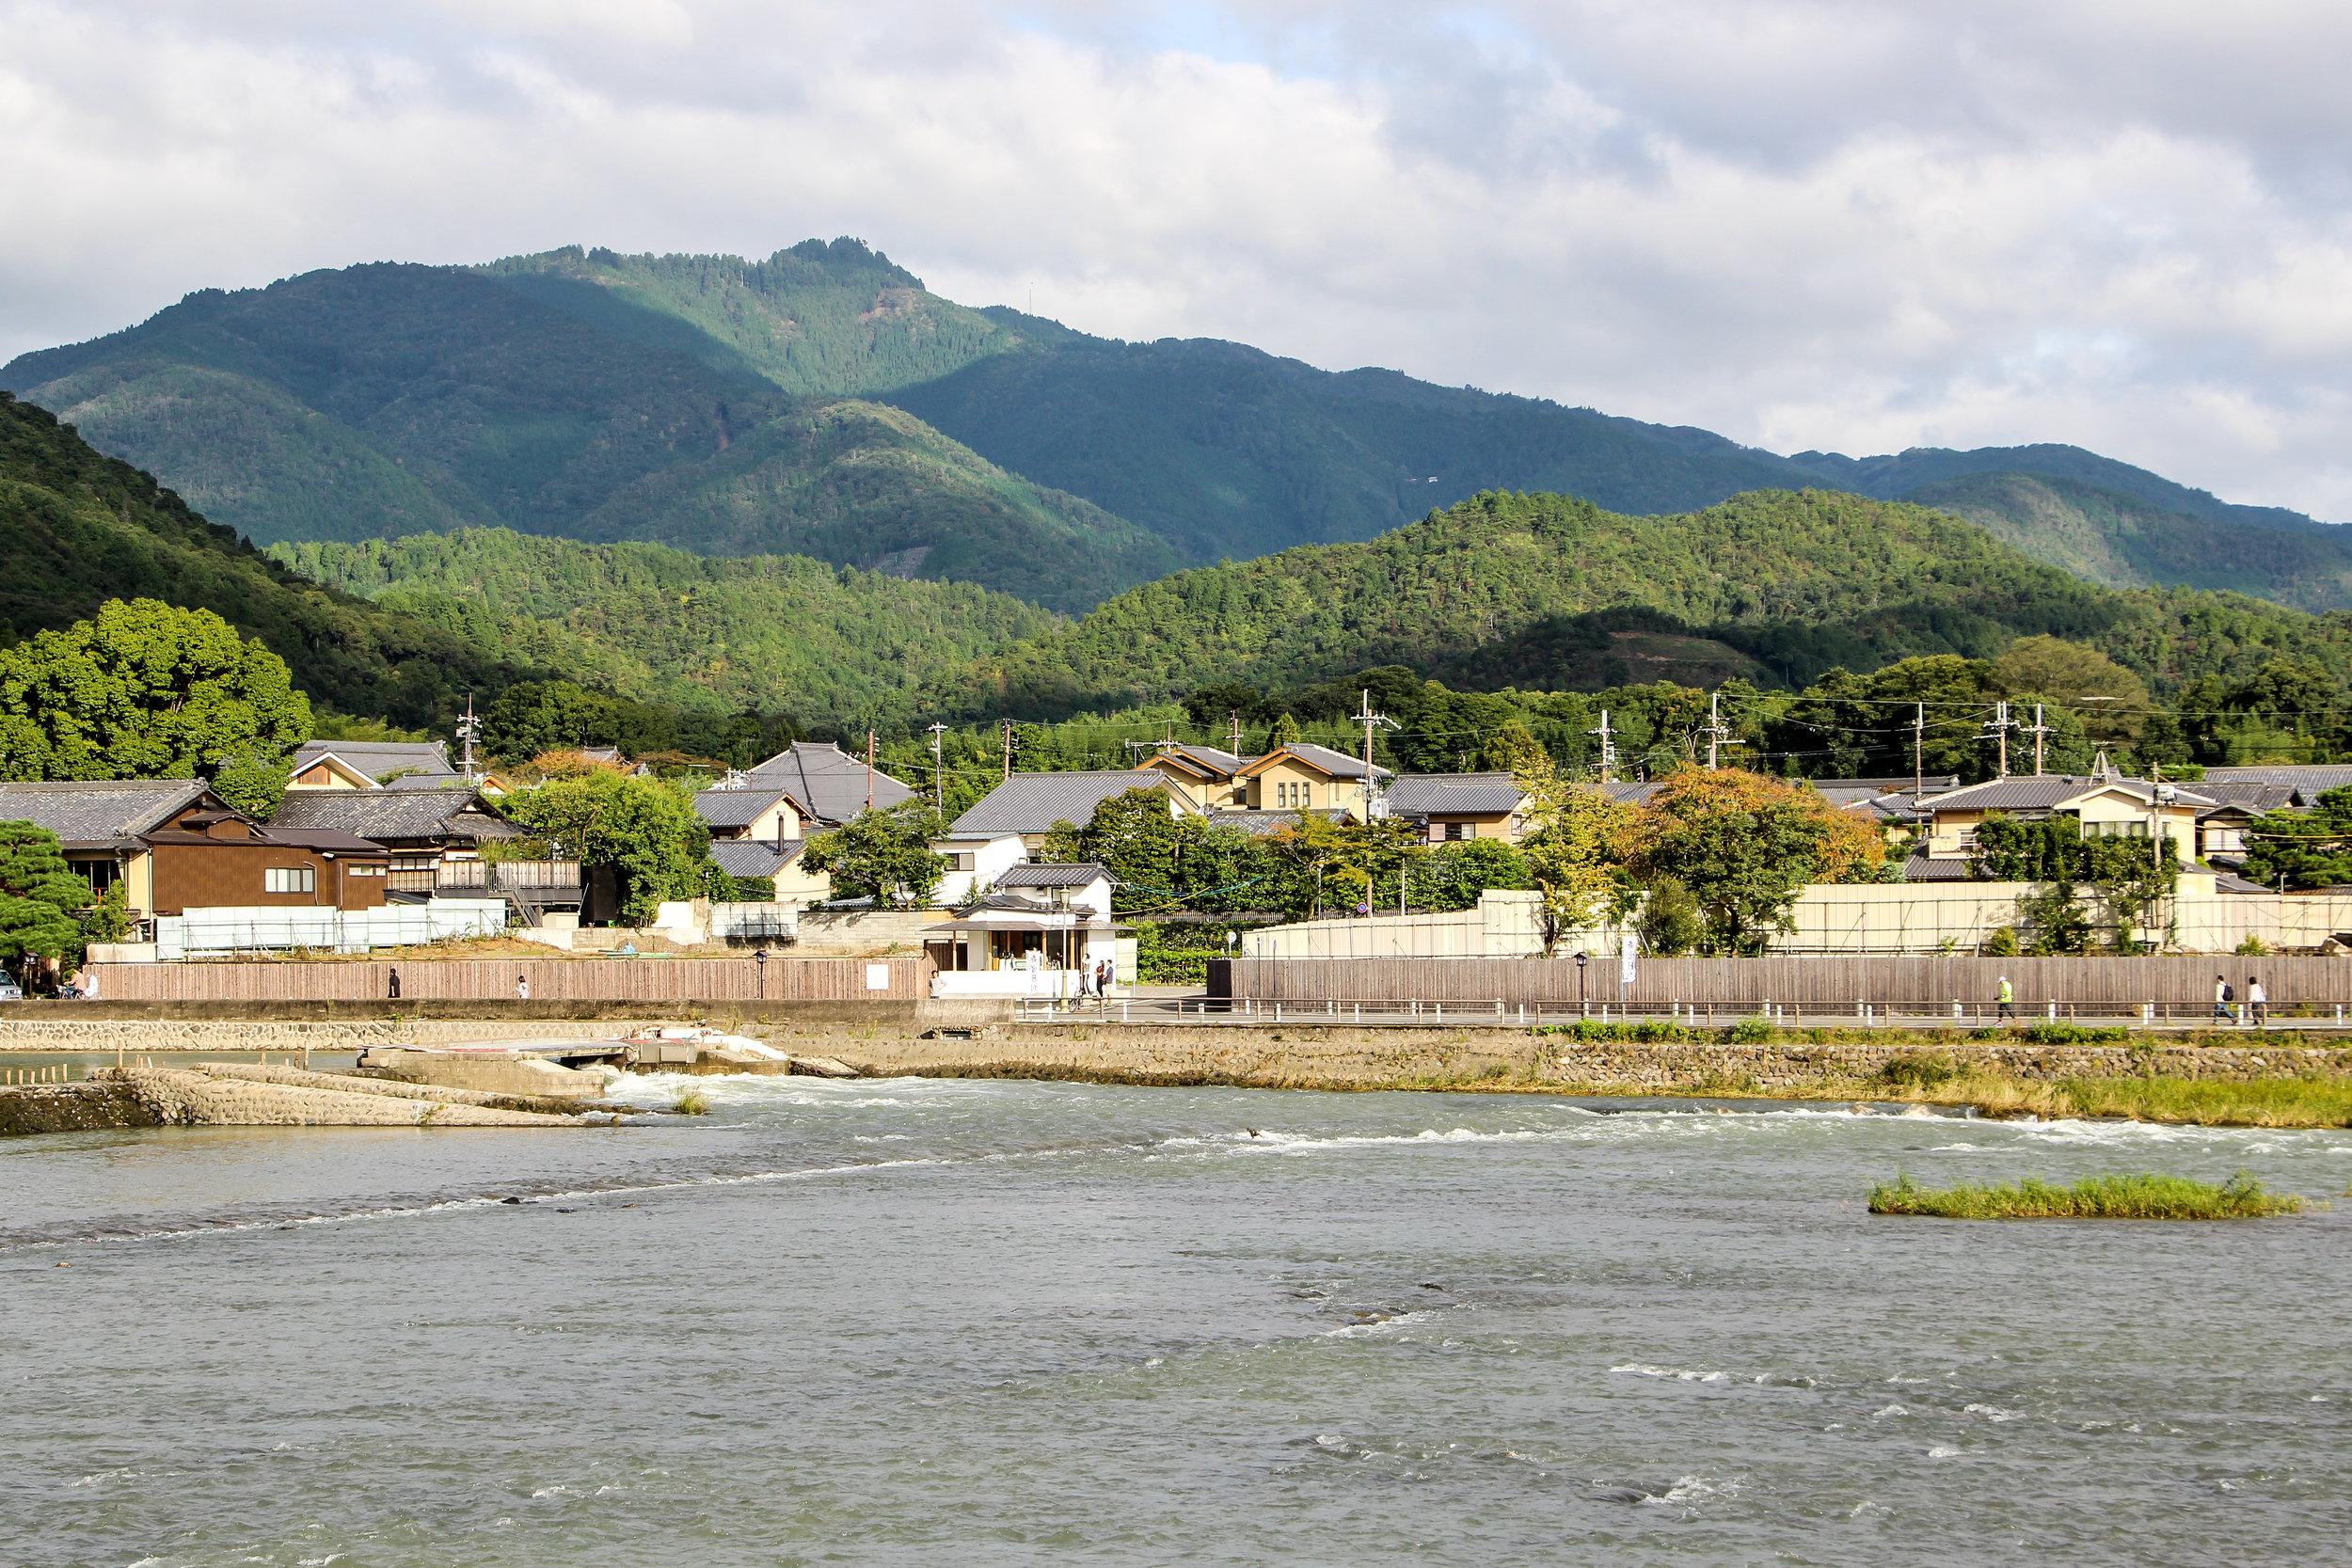 Katsura River, Arashiyama Mountain, Kyoto, Japan, East Asia | DoLessGetMoreDone.com |